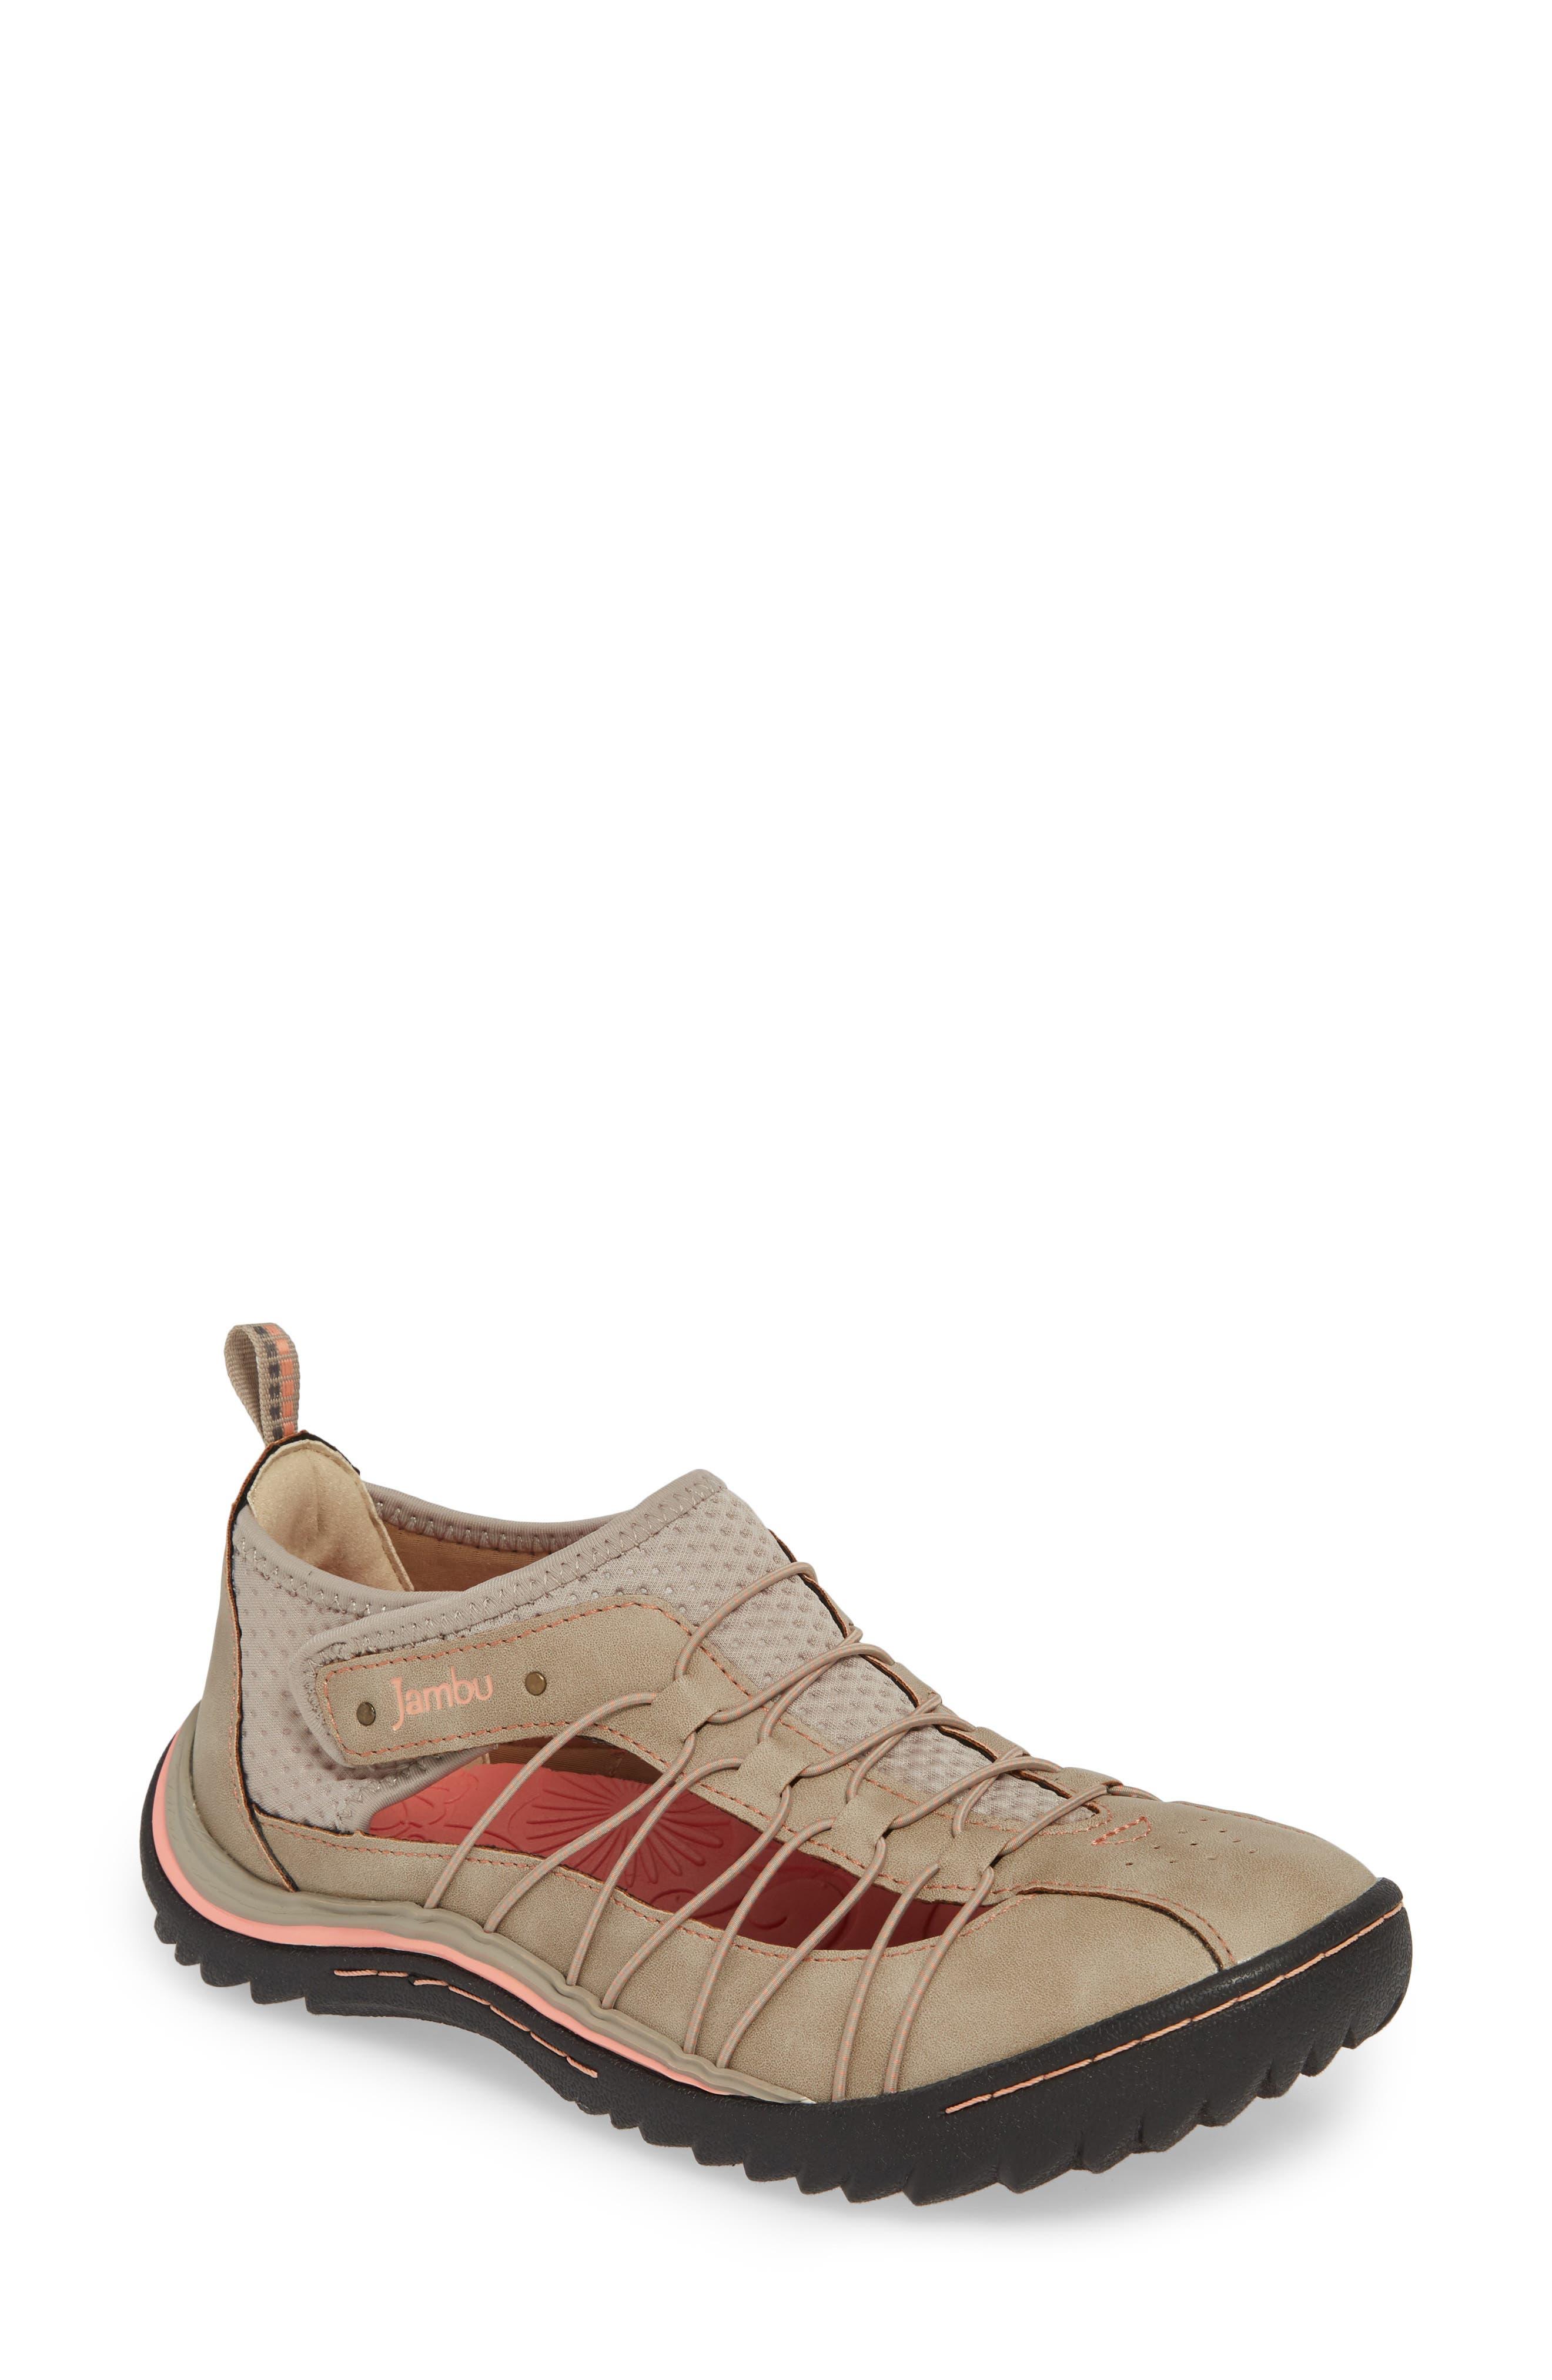 Jambu Free Spirit Sneaker- Beige